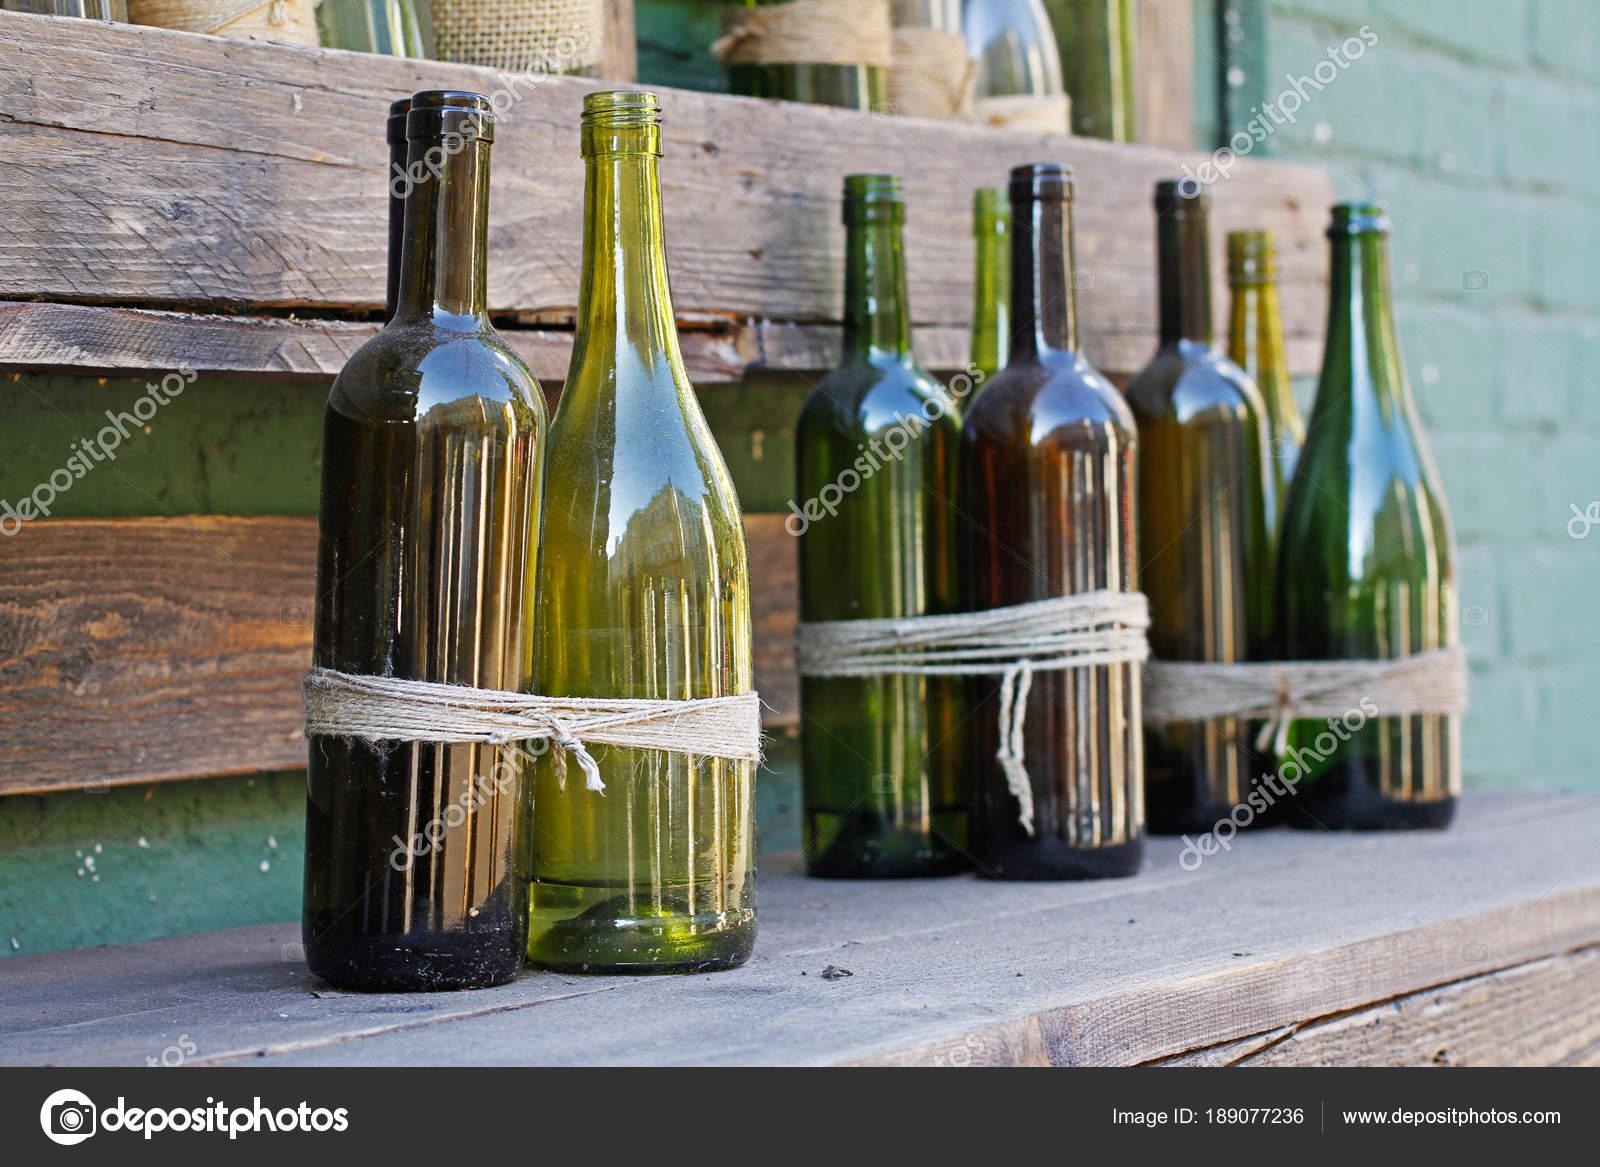 Botellas Vidrio Decoracion Con Guita Cajas Madera Foto De Stock - Vidrio-decoracion